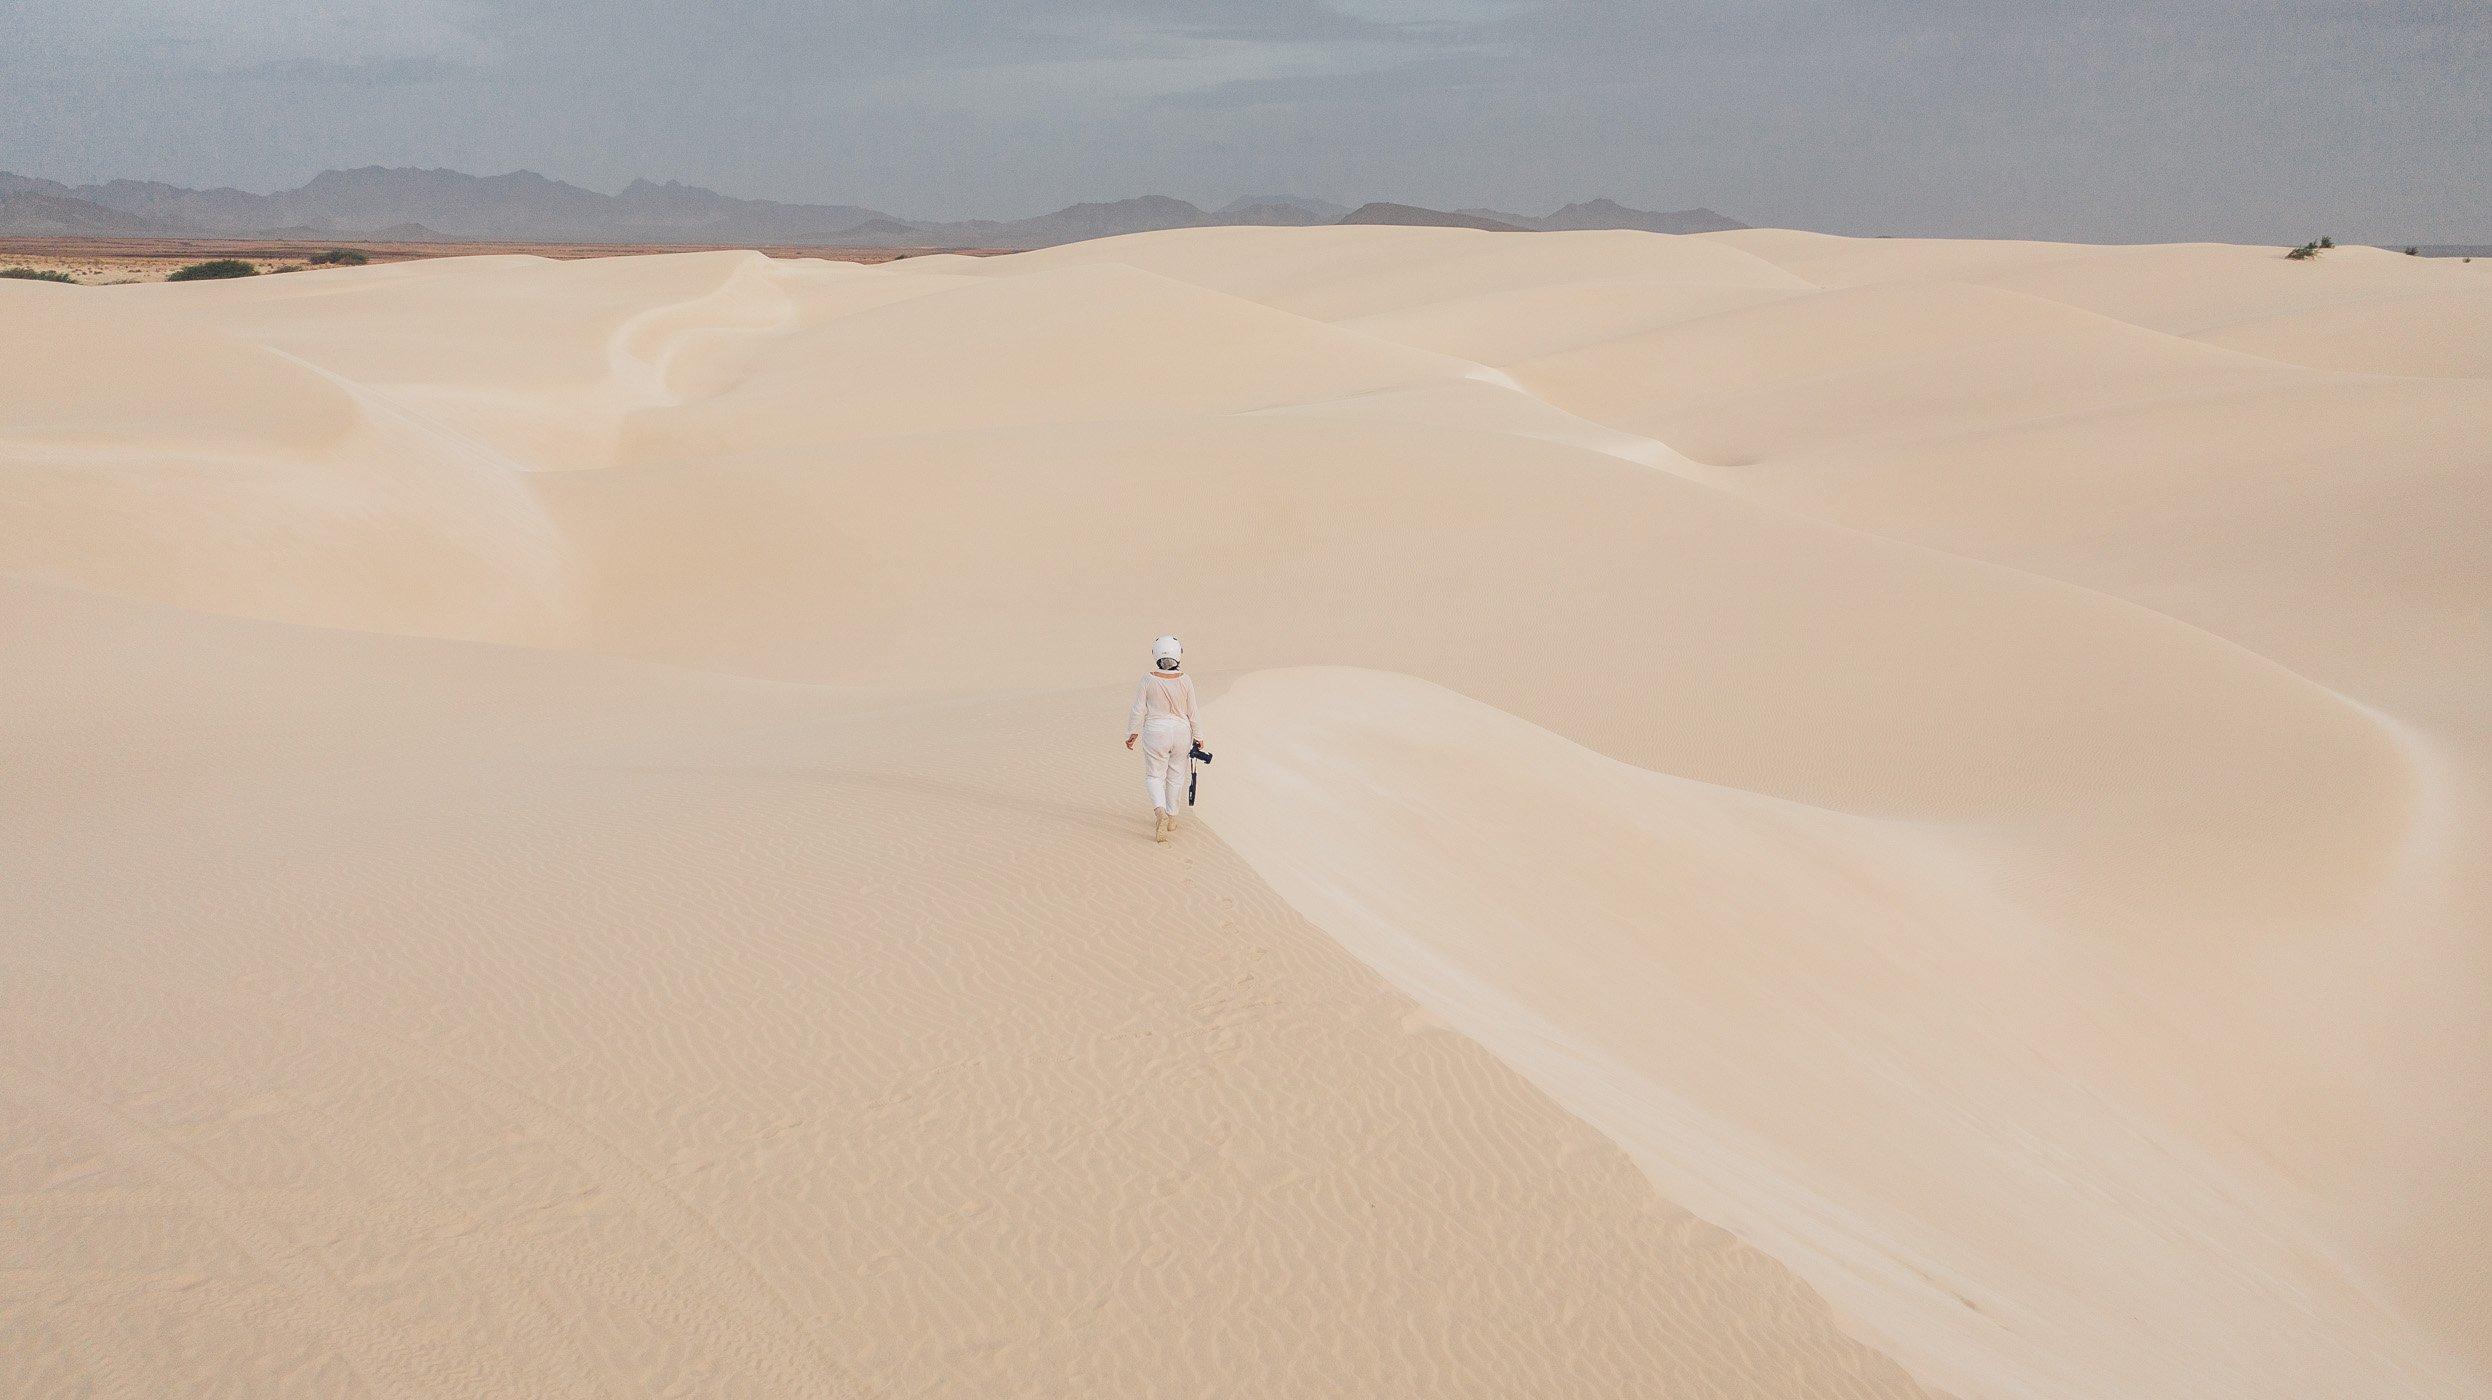 Deserto de Viana Boa Vista Cape Verde